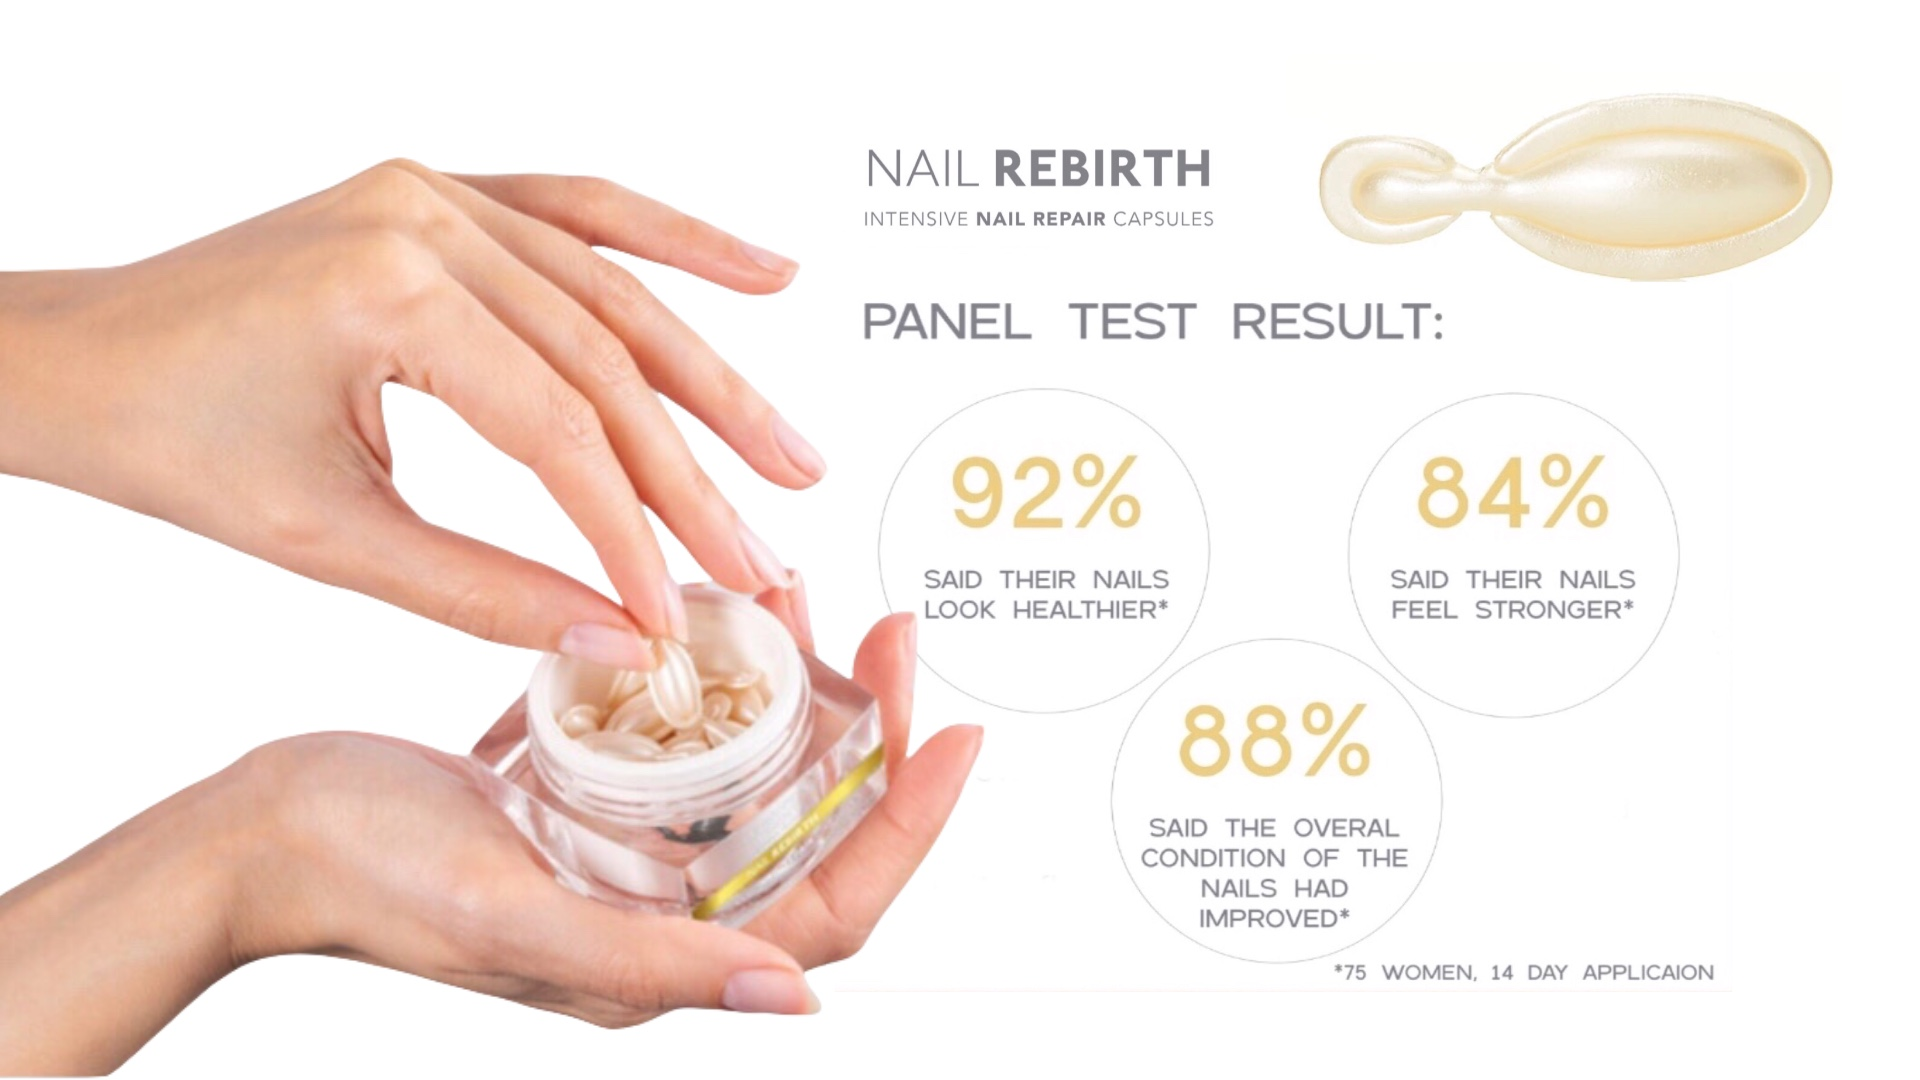 Video: Nail Rebirth